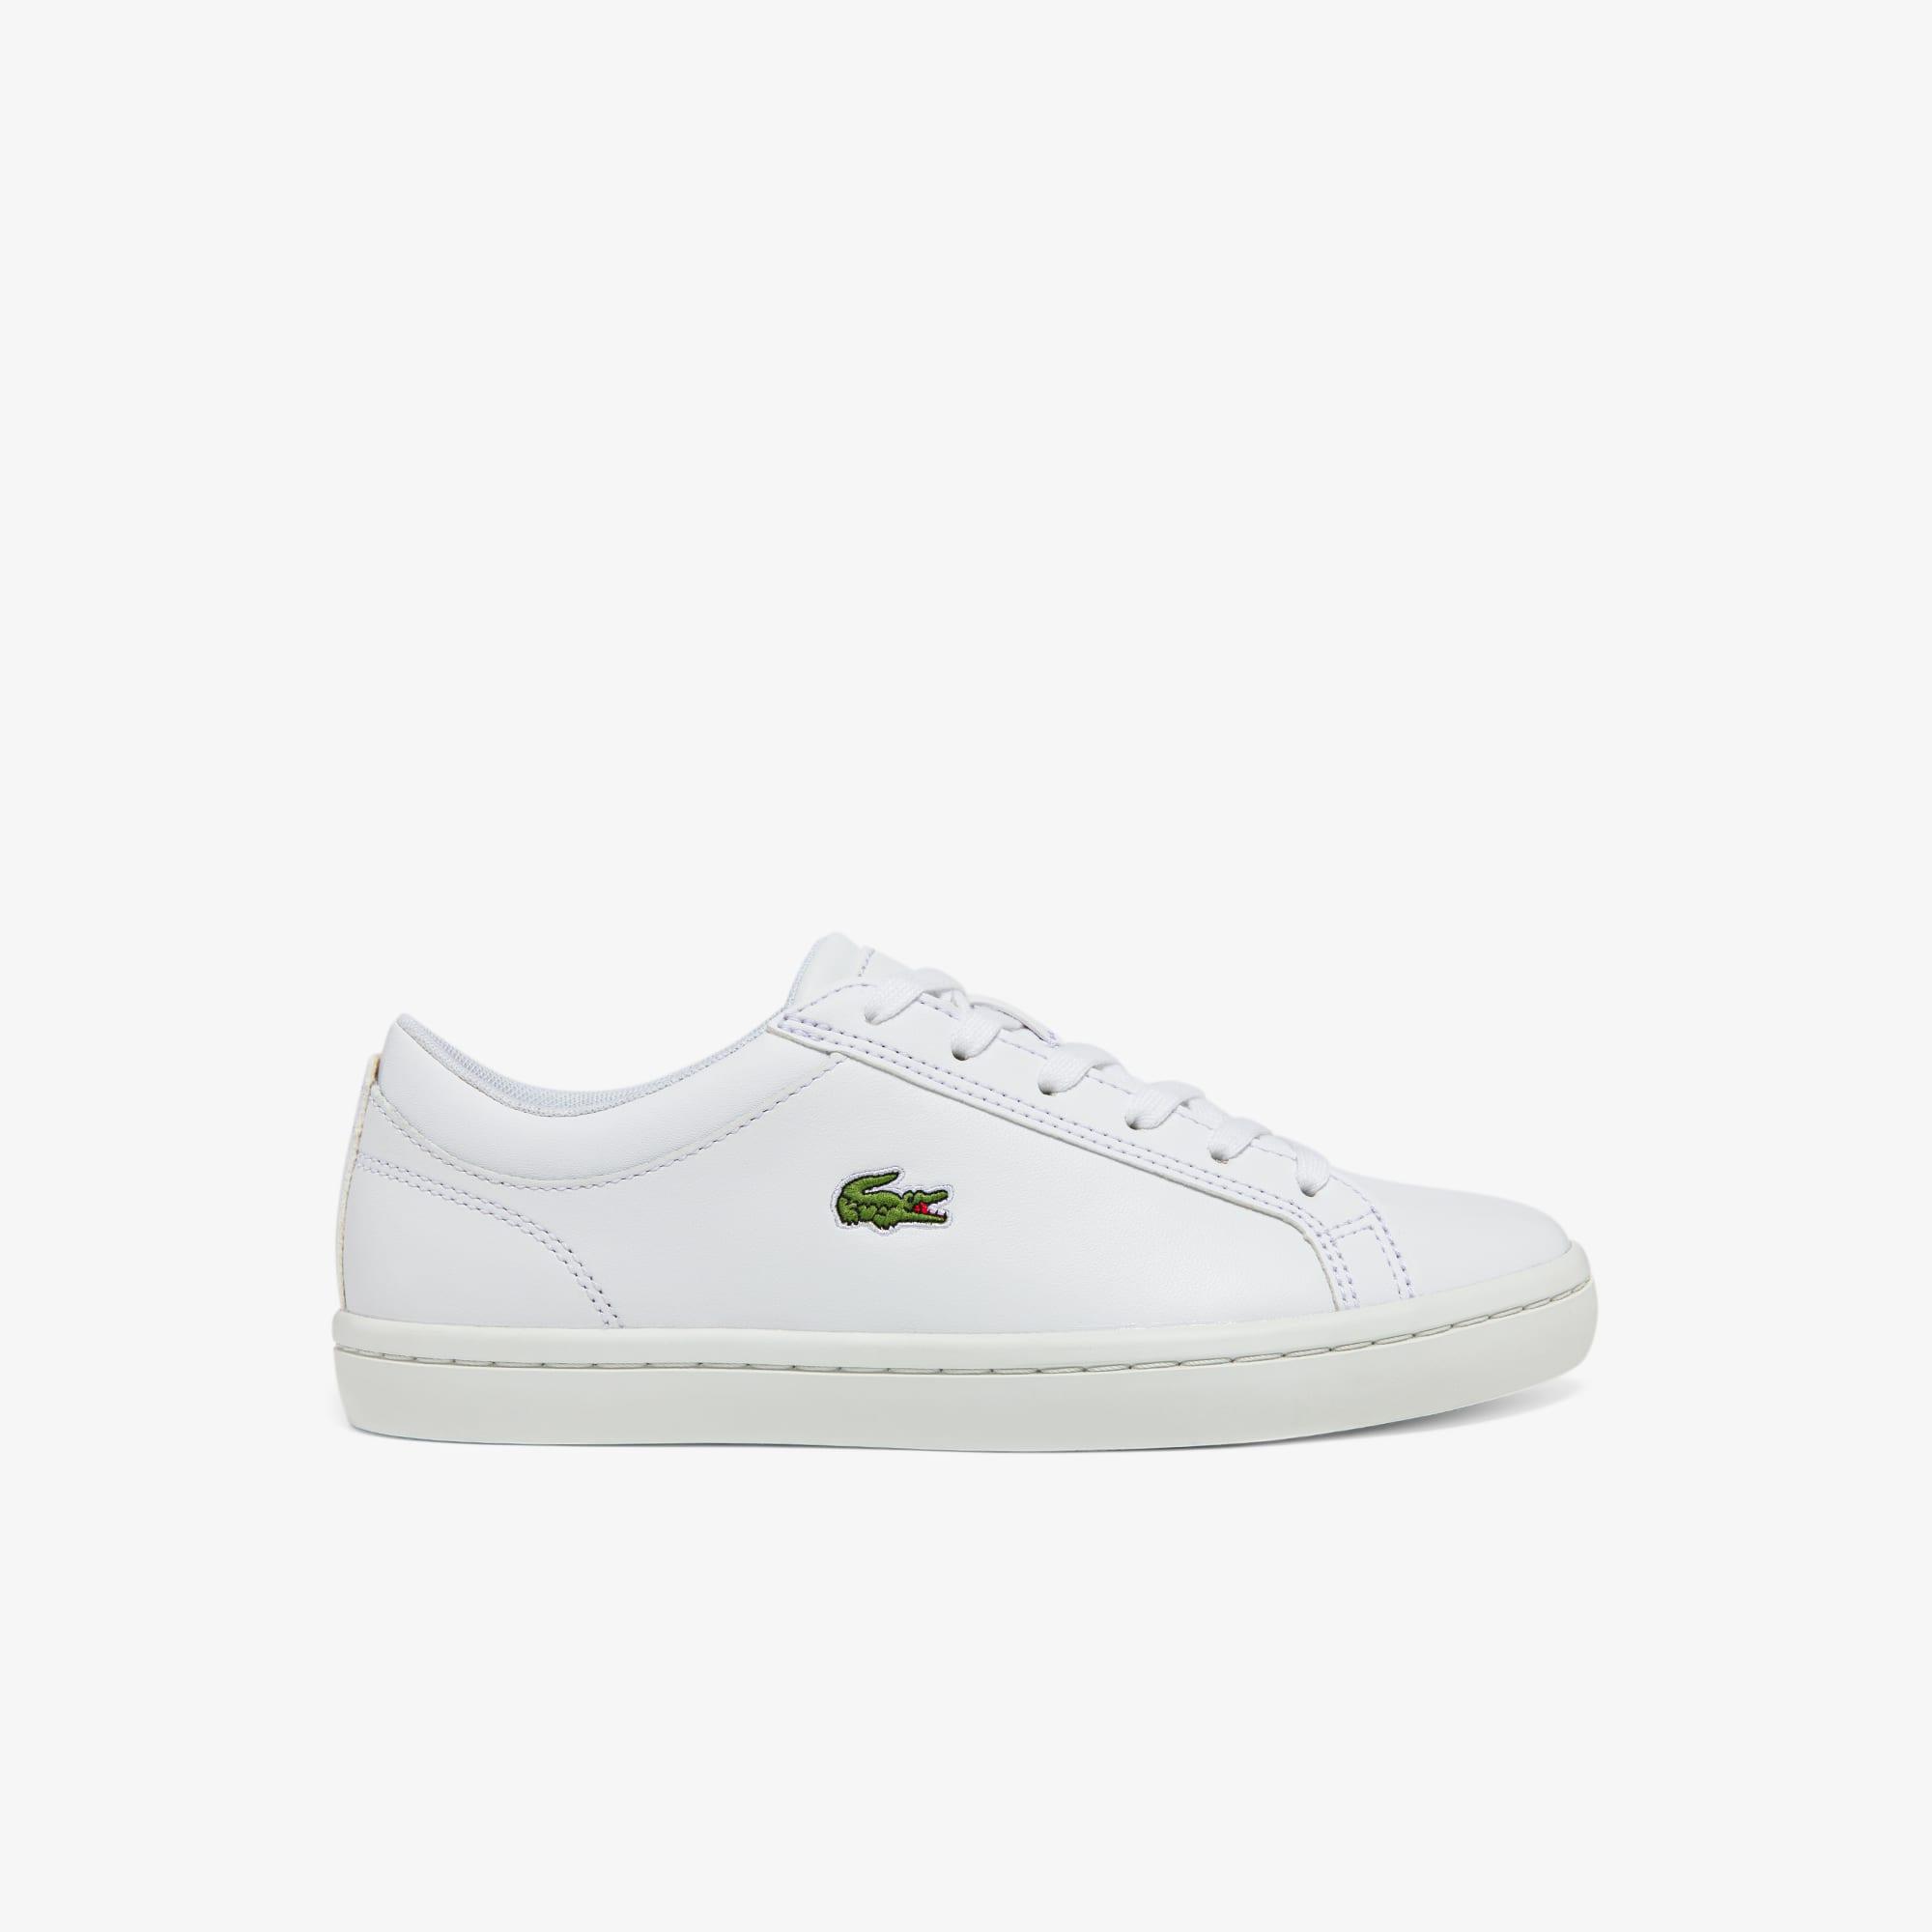 Sneakers Straightset in pelle materiale sintetico